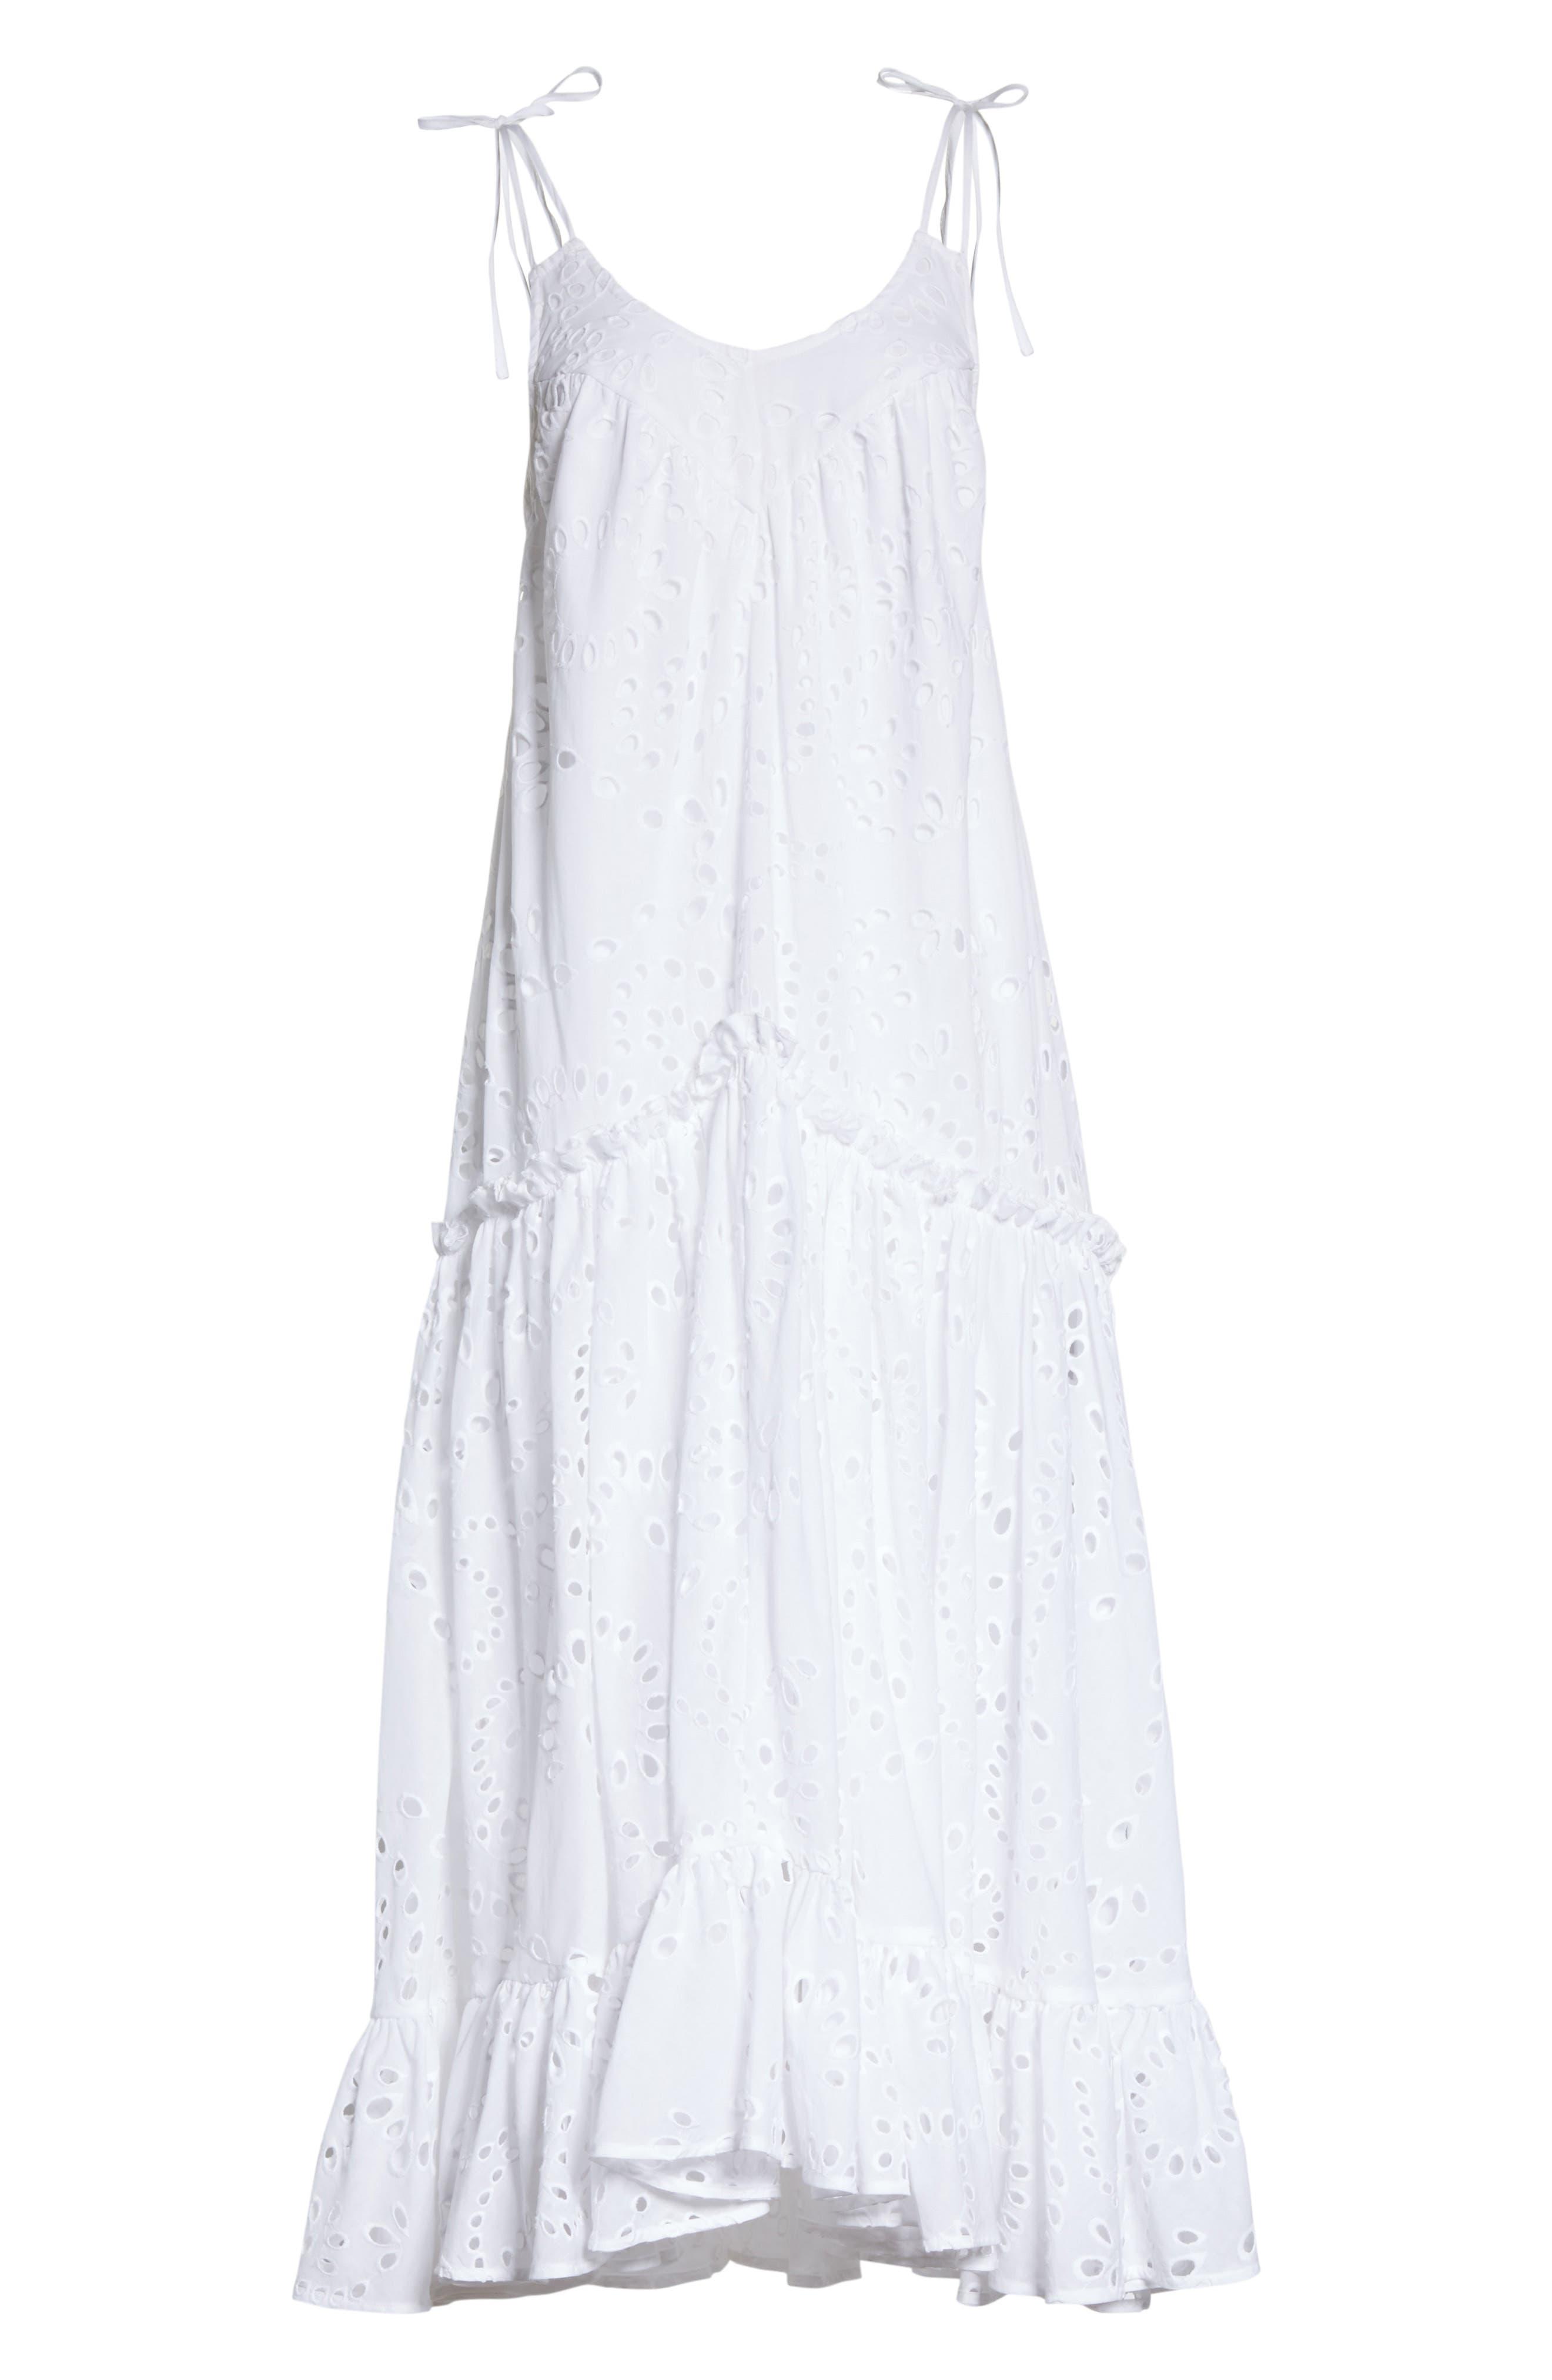 Prose & Poetry Kerr Eyelet Peasant Midi Dress,                             Alternate thumbnail 6, color,                             Cloud White